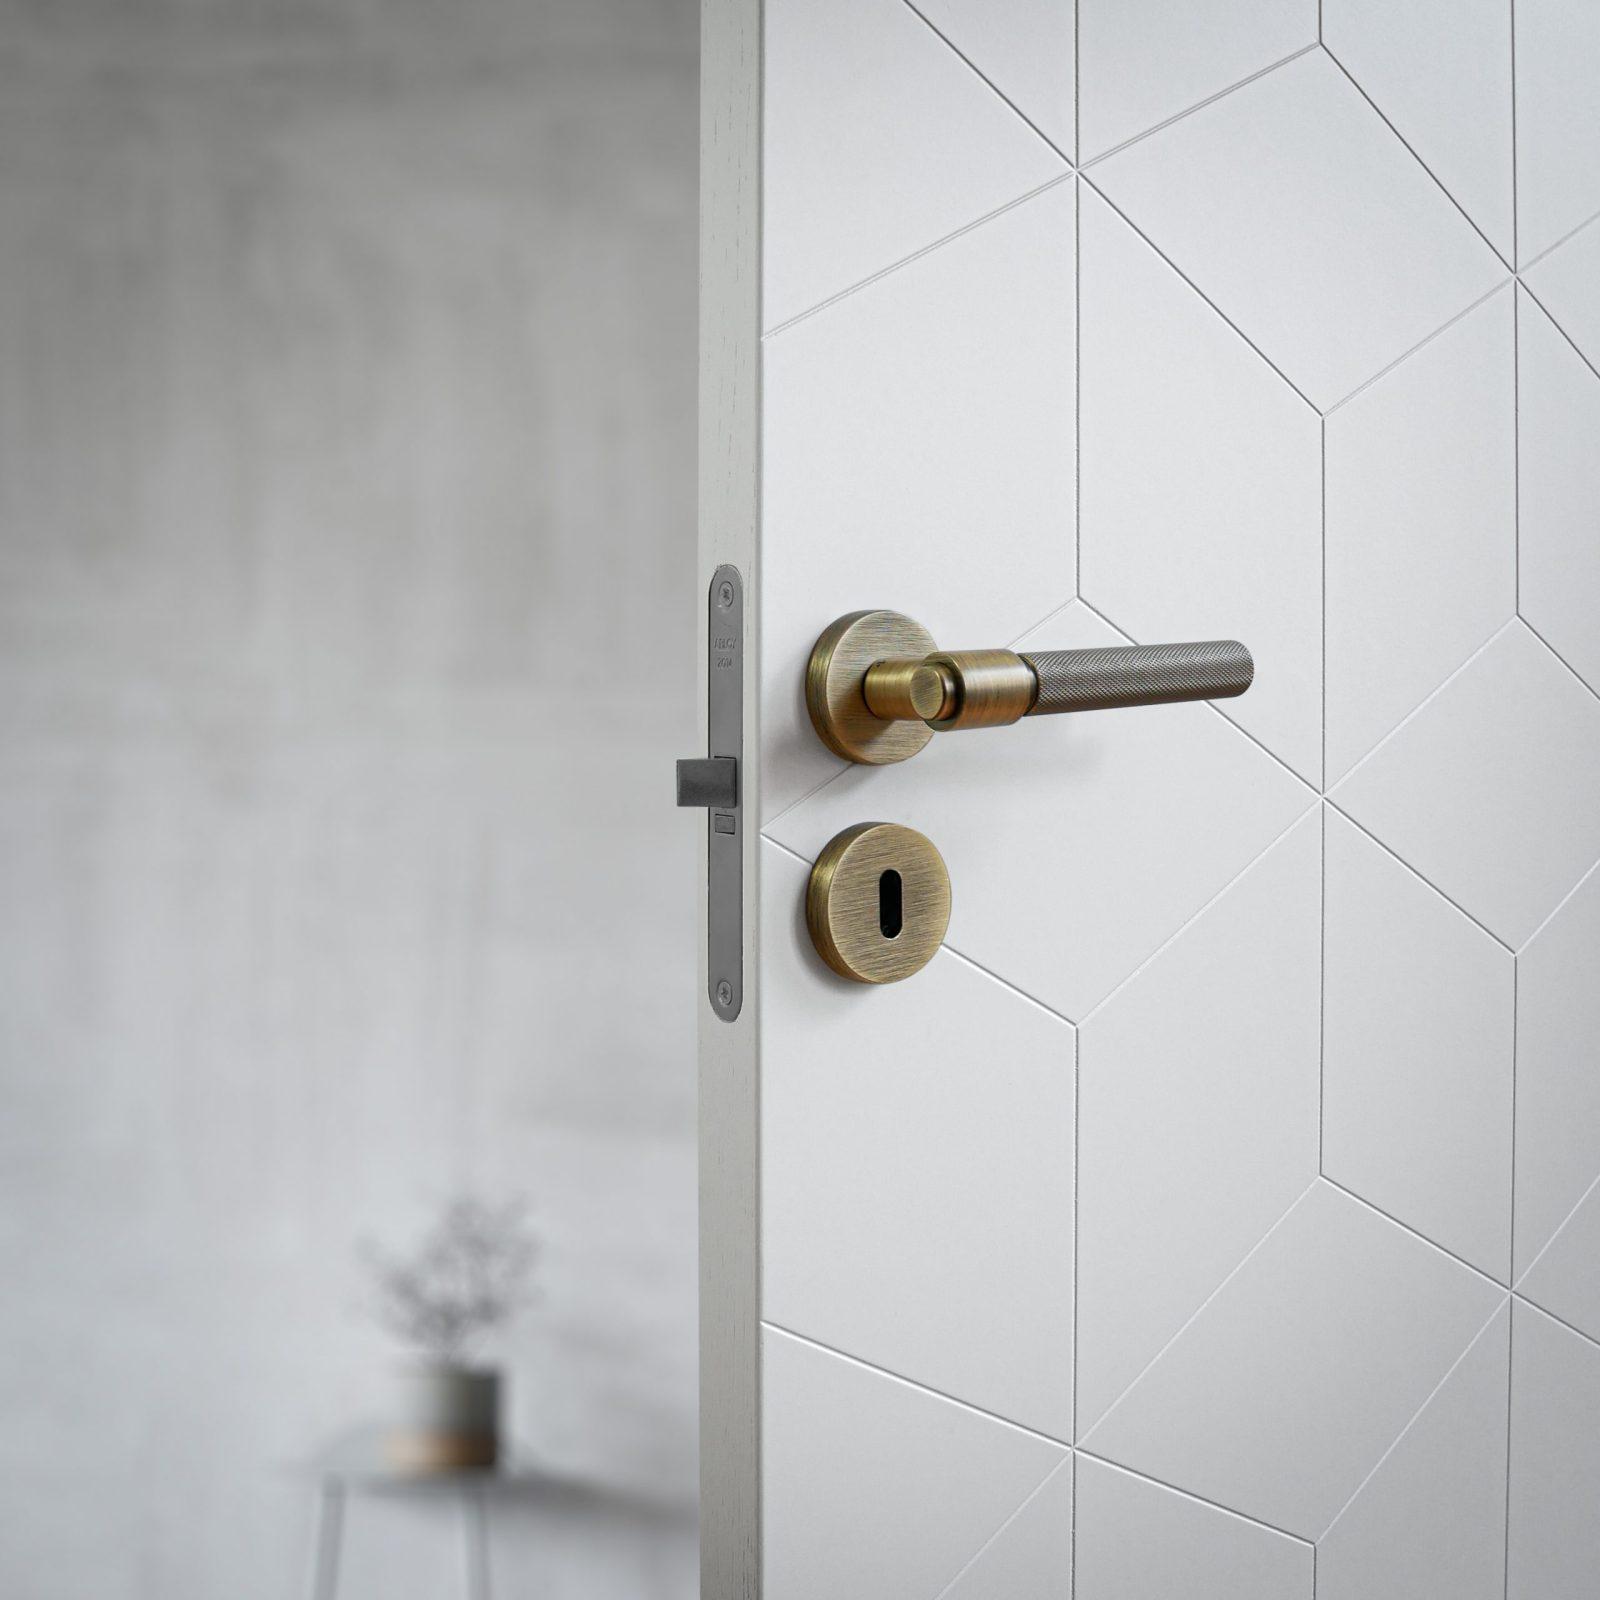 dörrhandtag-helix-200-antik-brons-beslag-design